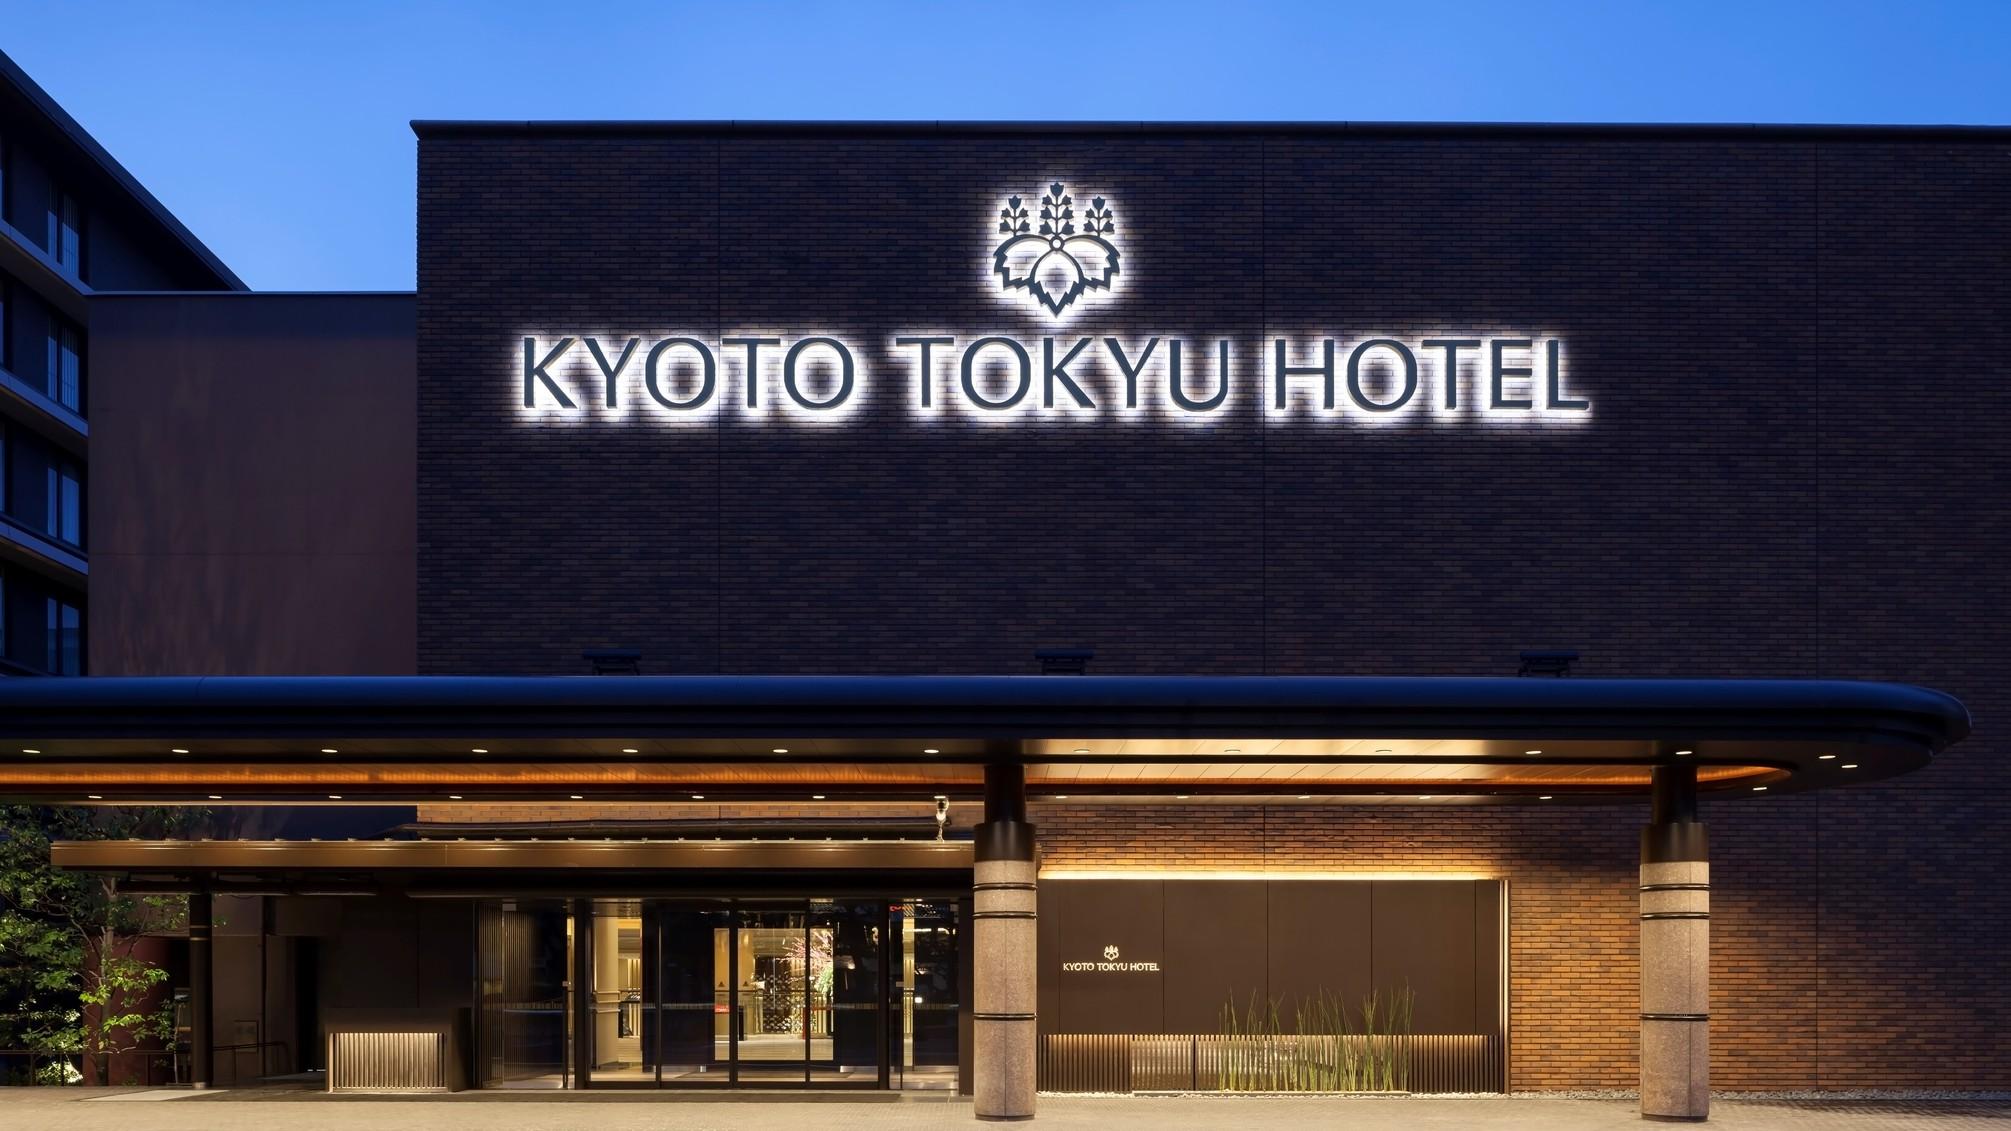 京都東急ホテル外観